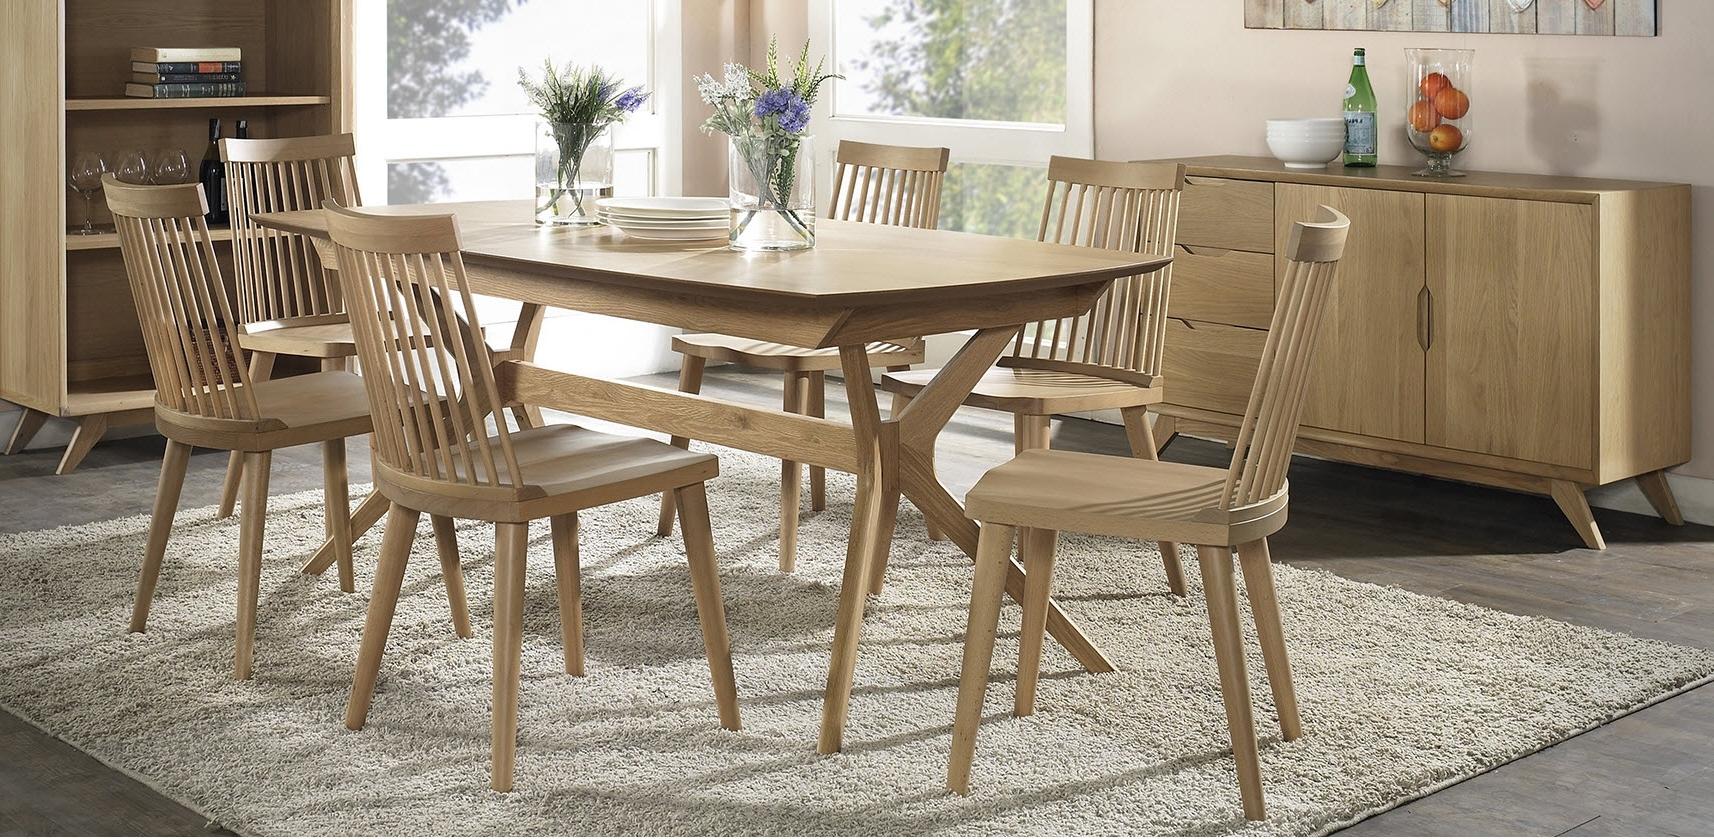 Dining Suites Melbourne – Sofa Concept Regarding Newest Oak Dining Suites (Gallery 24 of 25)